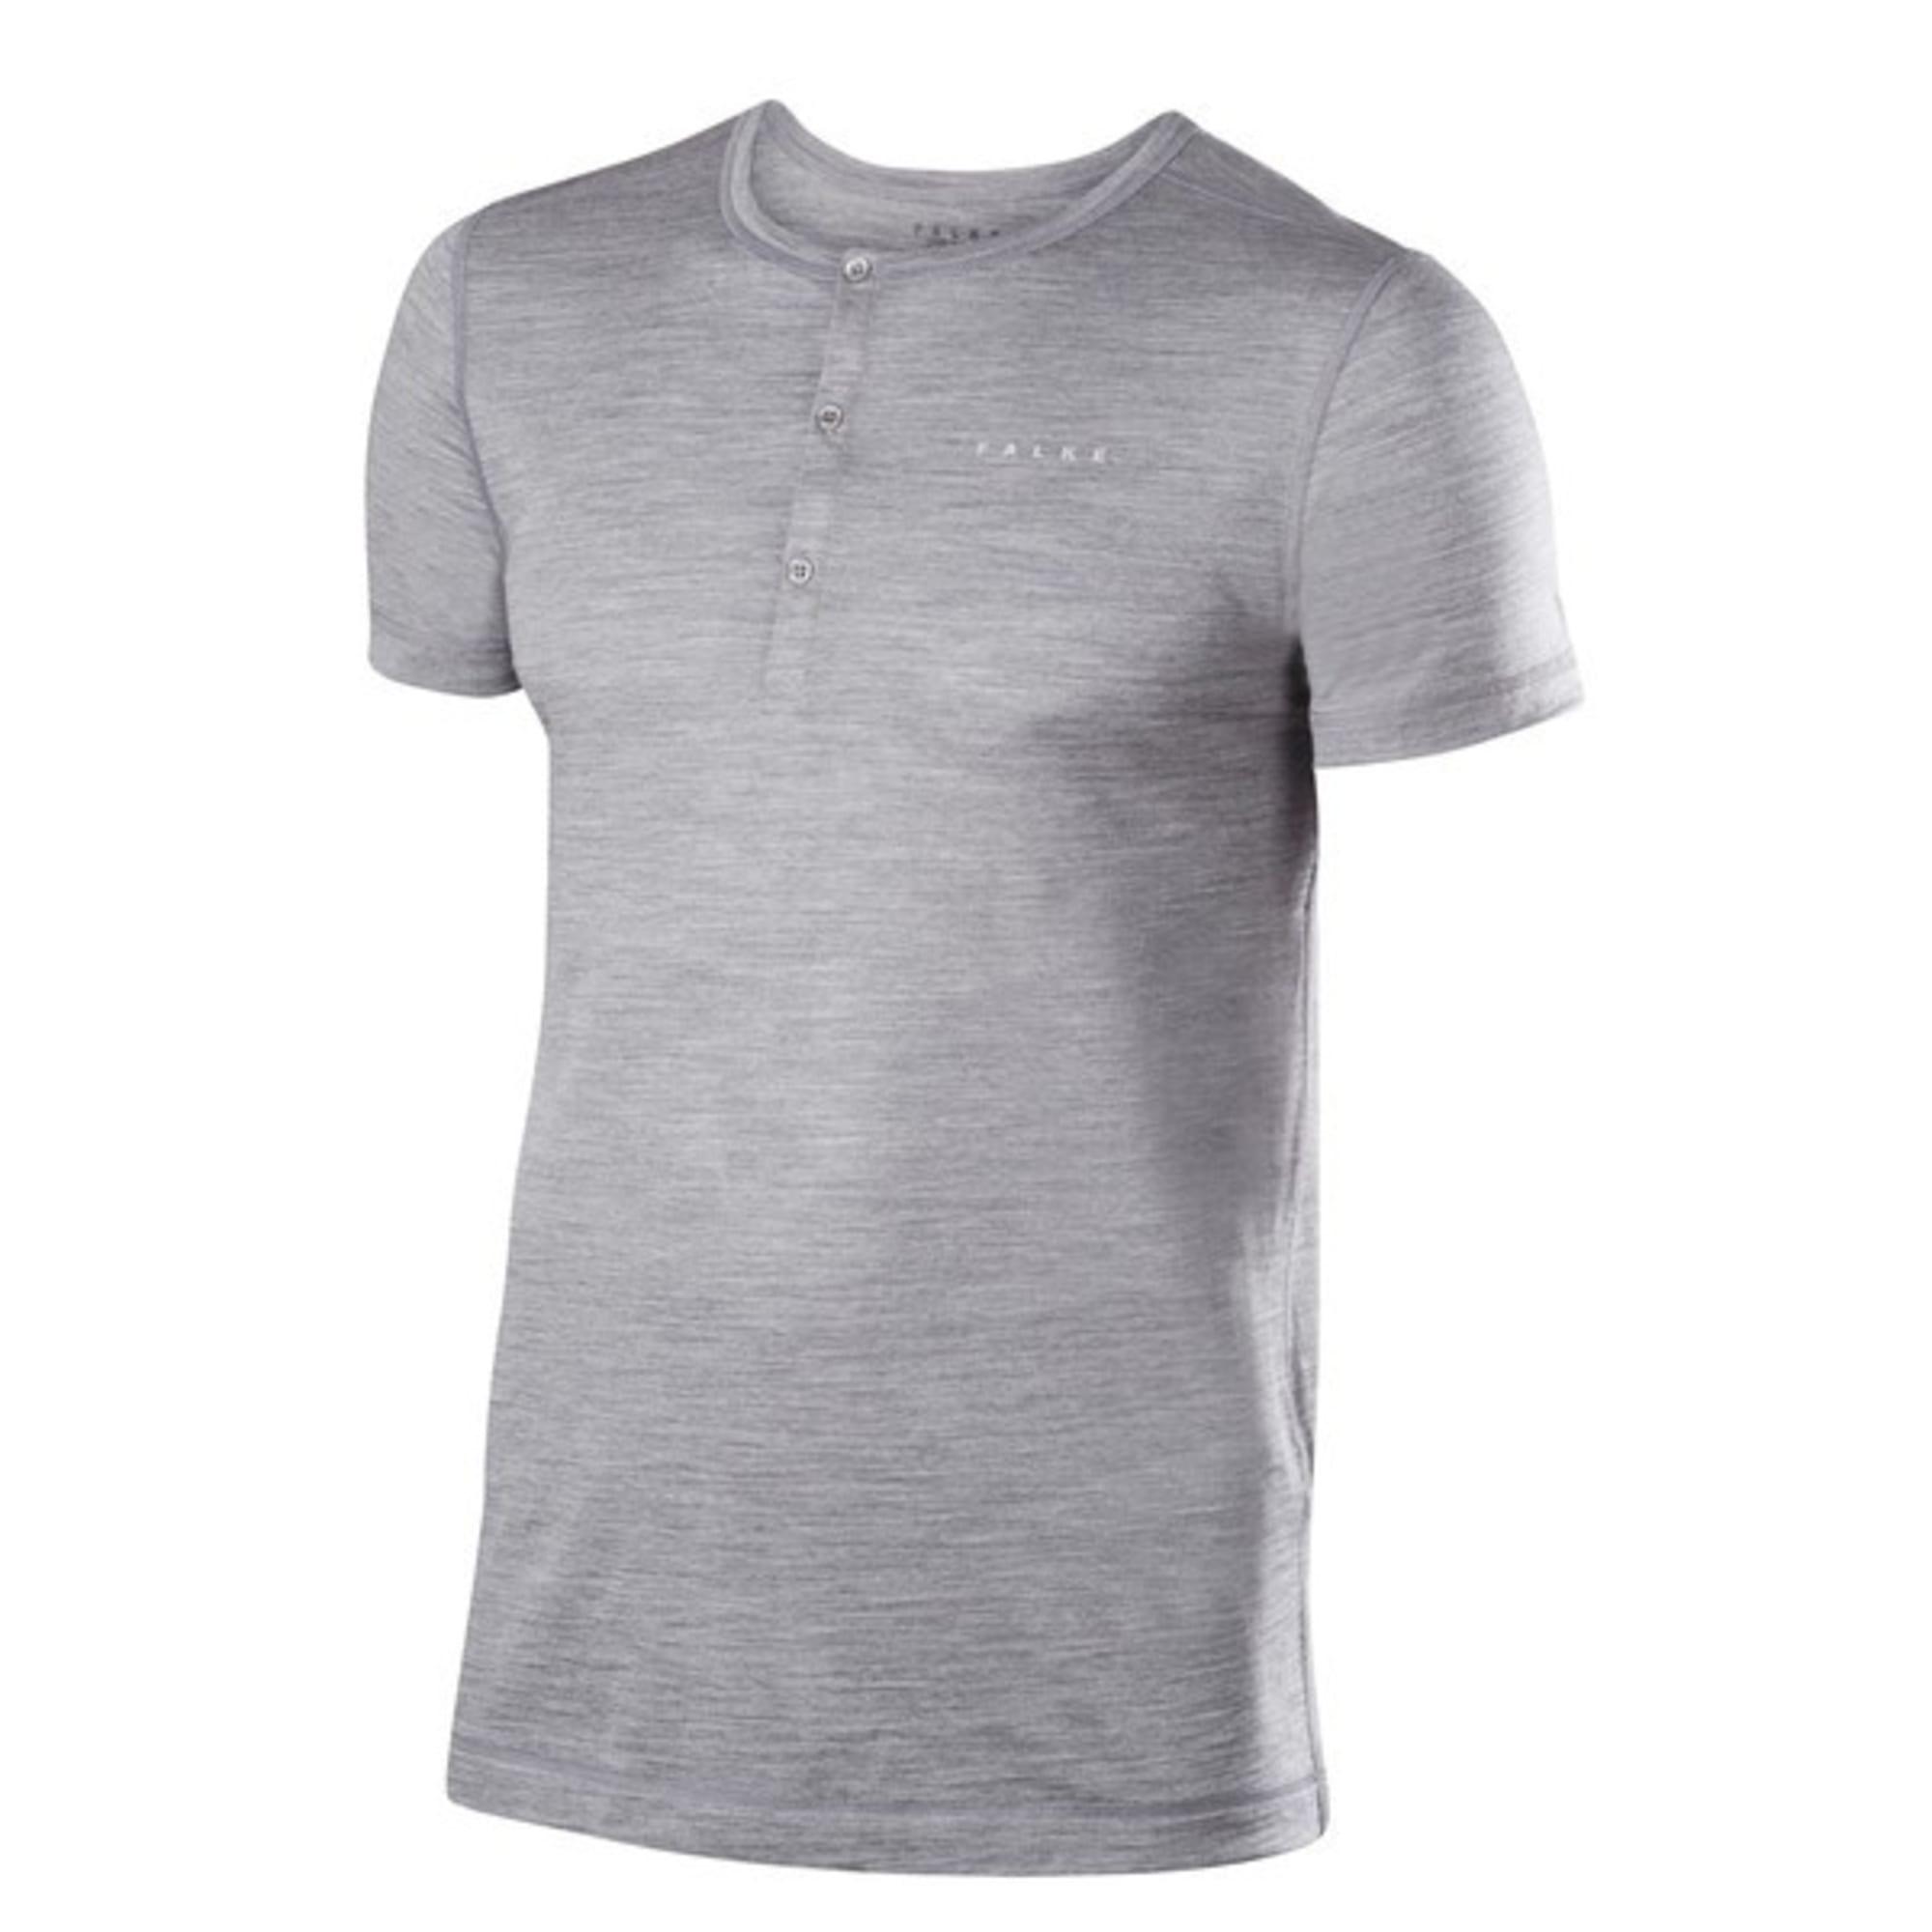 Tee-shirt FALKE Gris, anthracite